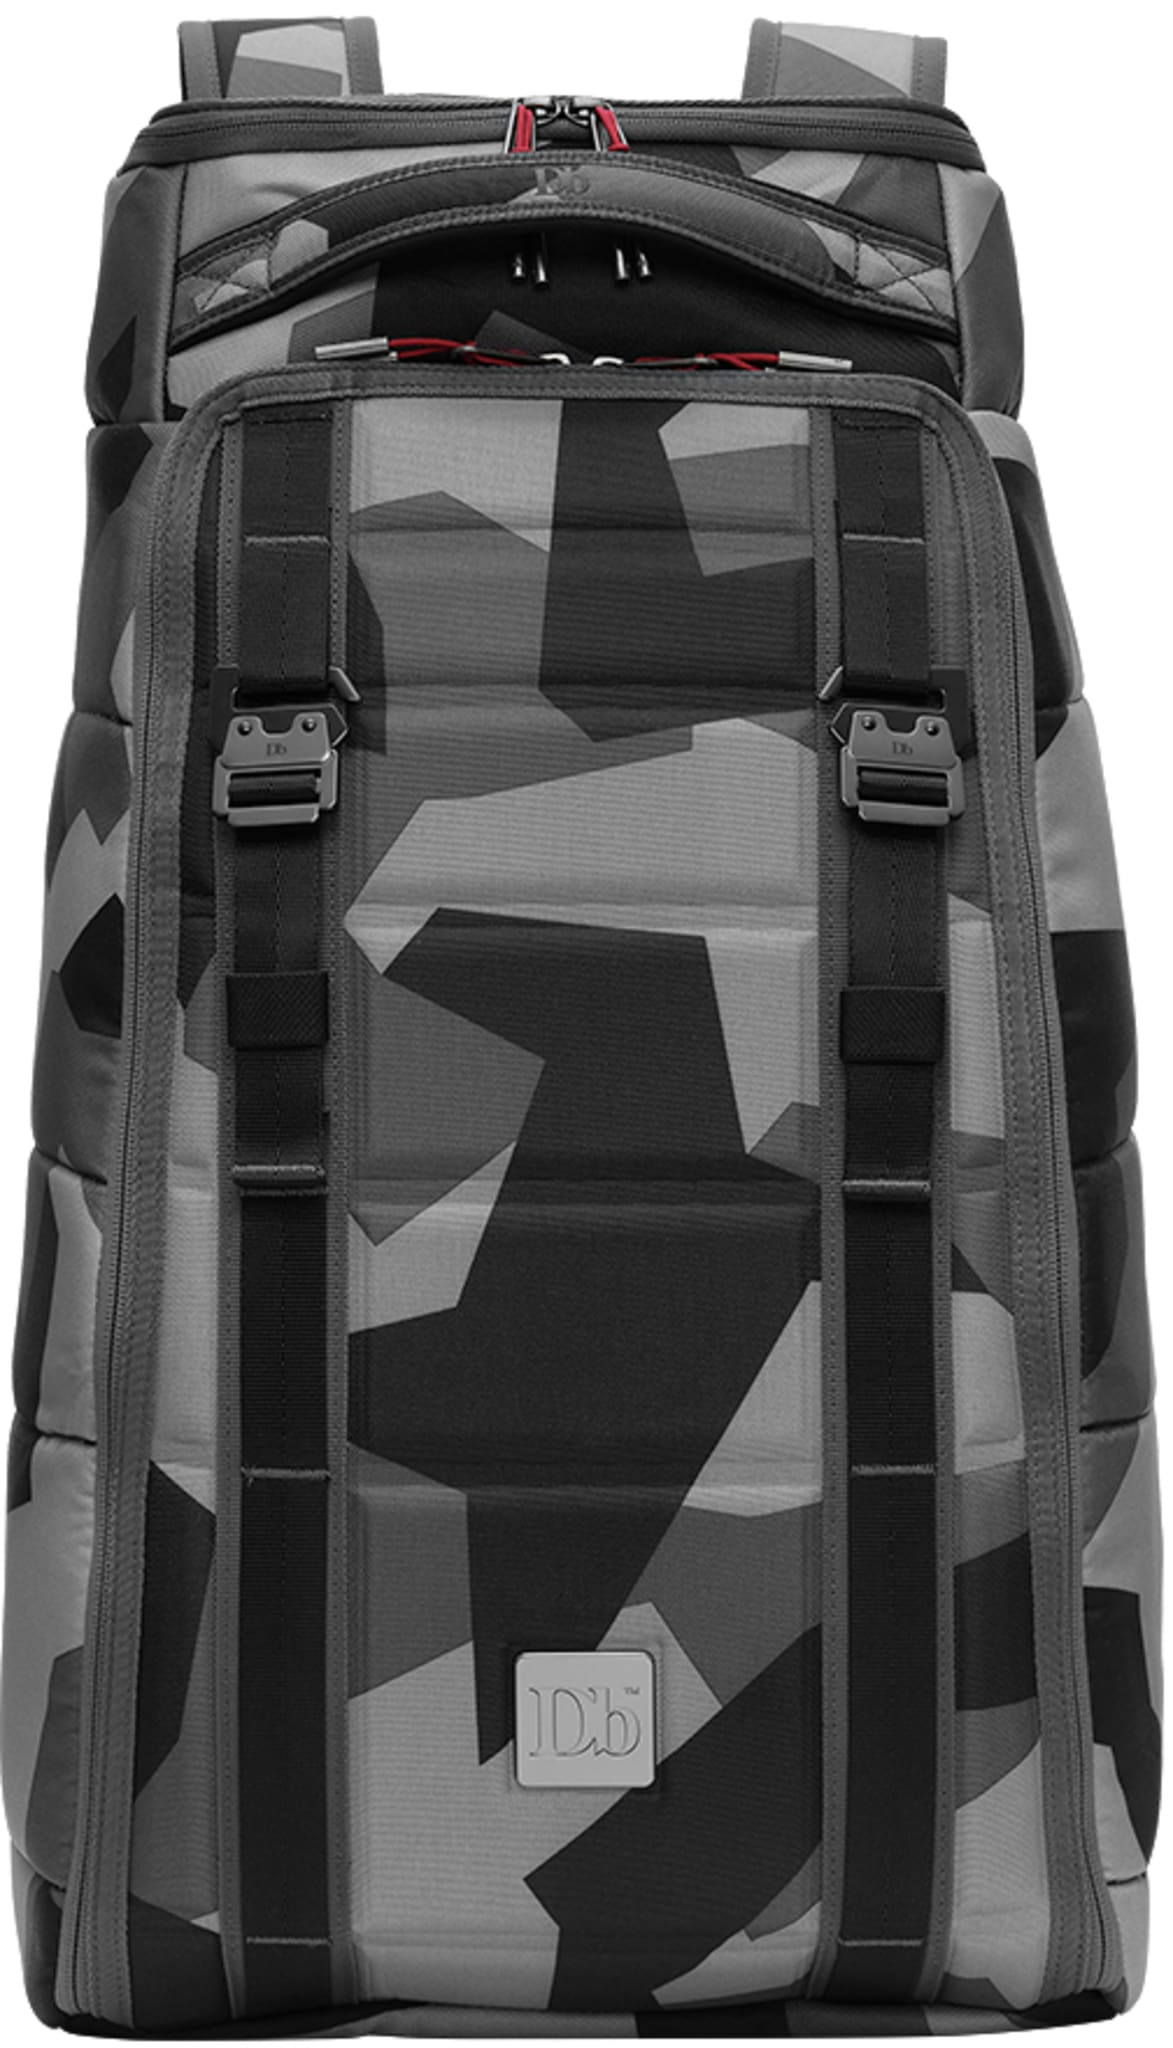 The Hugger 30L EVA - Camo Limited Edition